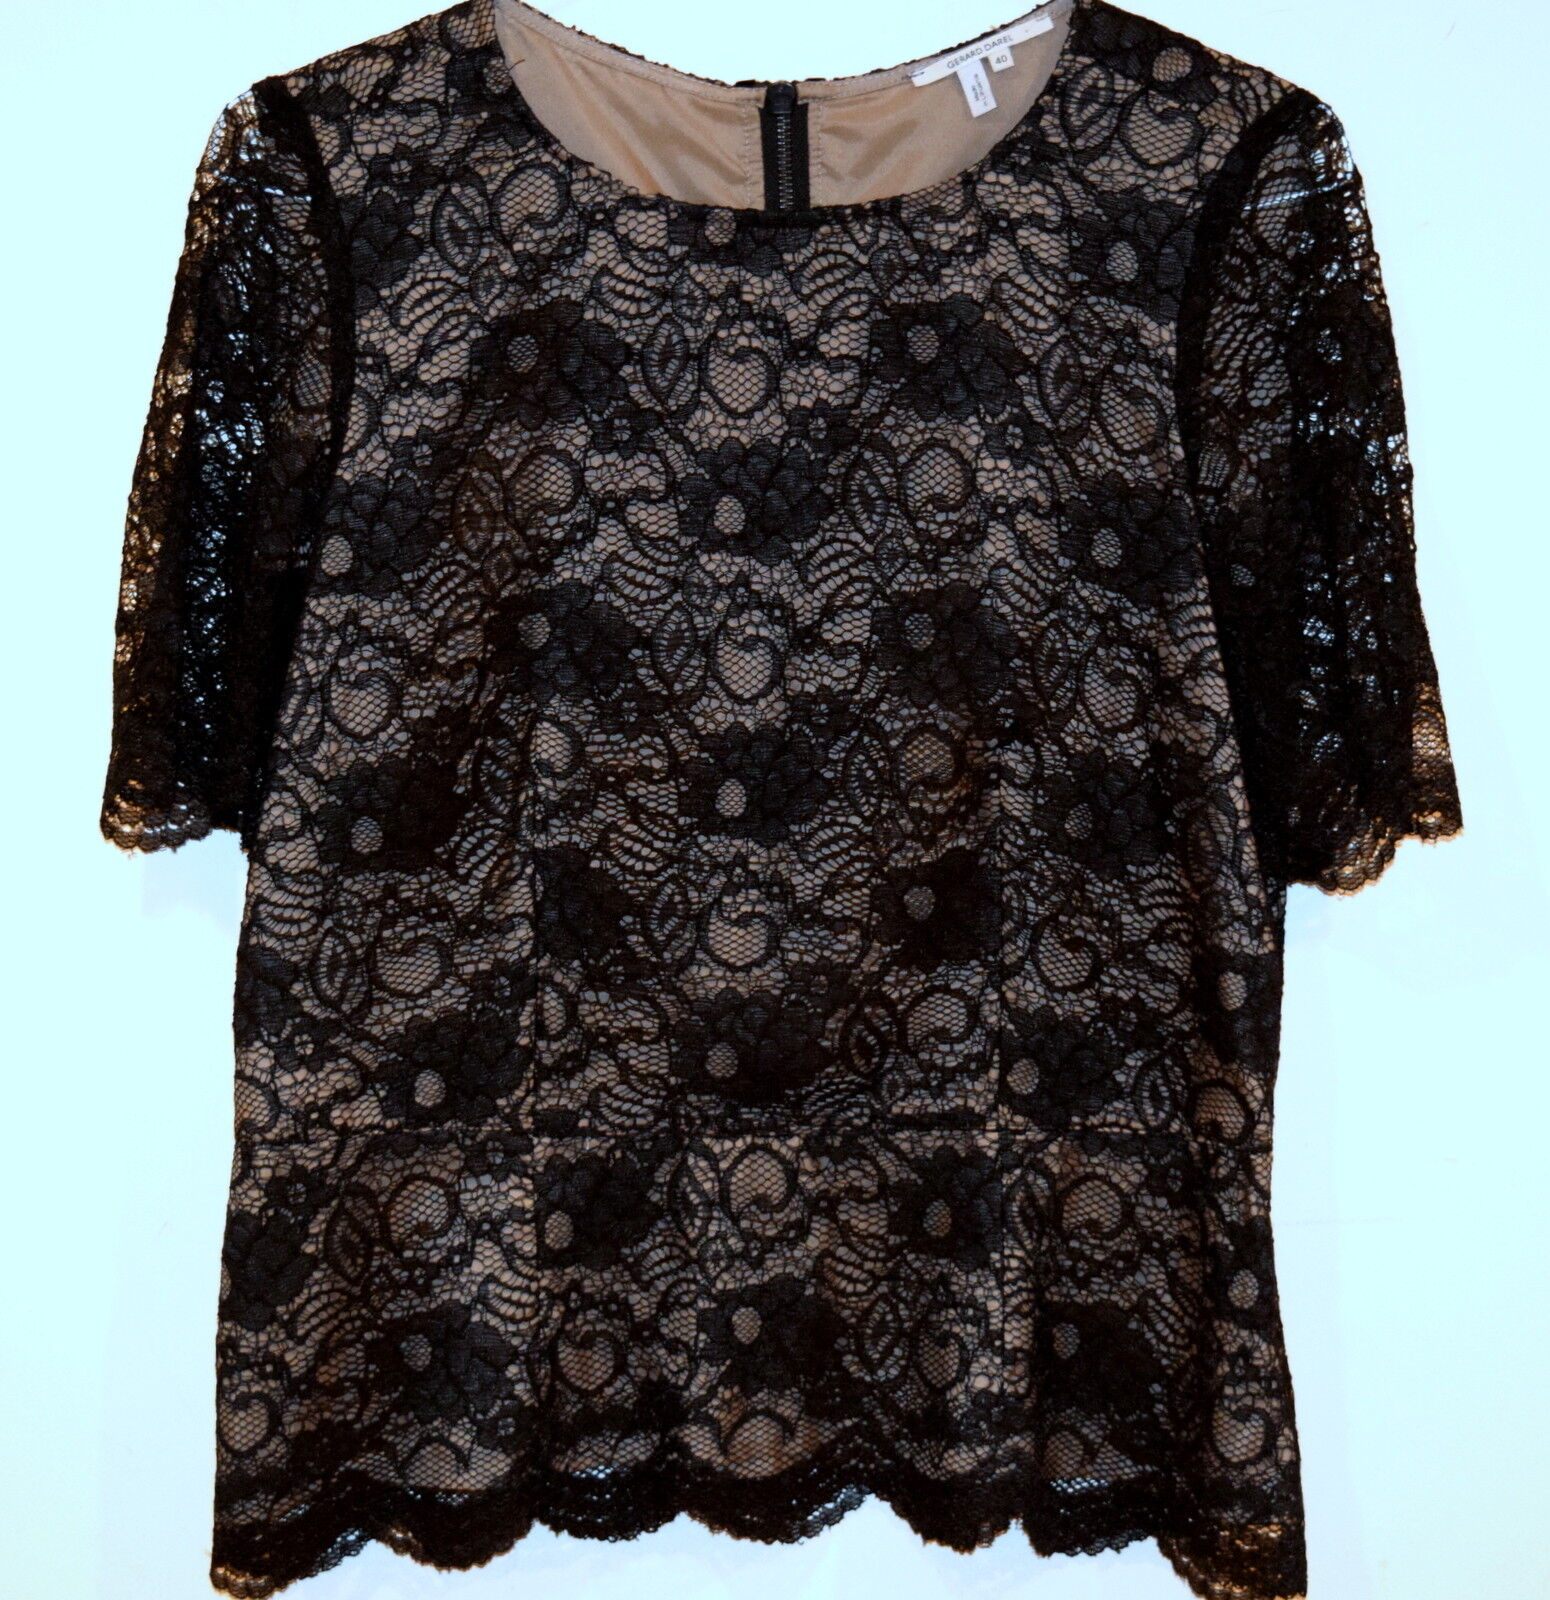 New damen GERARD DAREL Lace top Blouse Shirt Top Größe Large Weiß